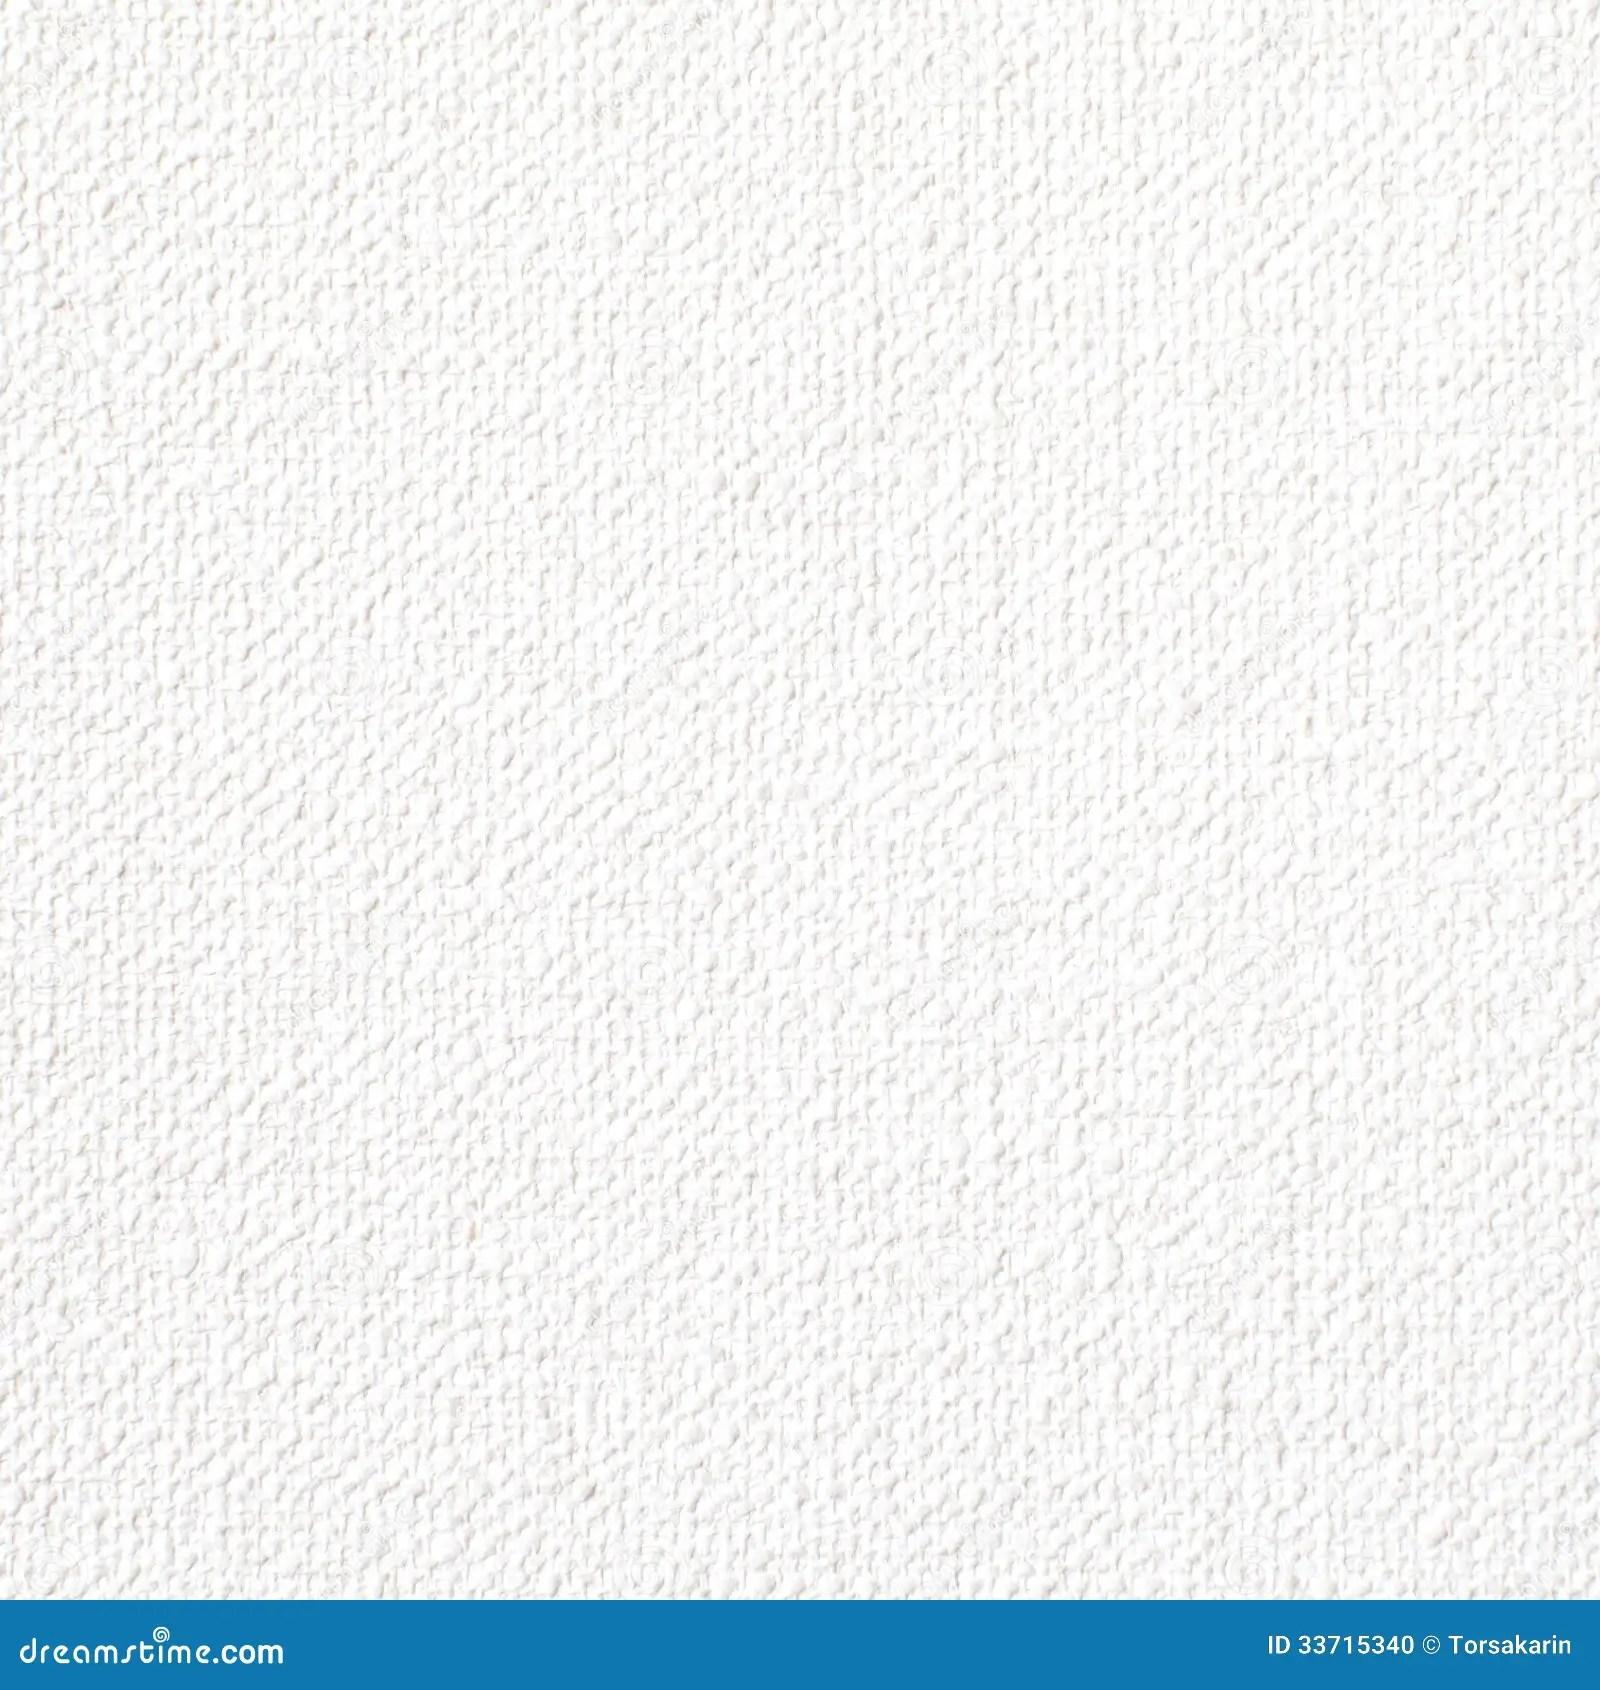 White Fabric Texture Stock Photo Image Of Frame